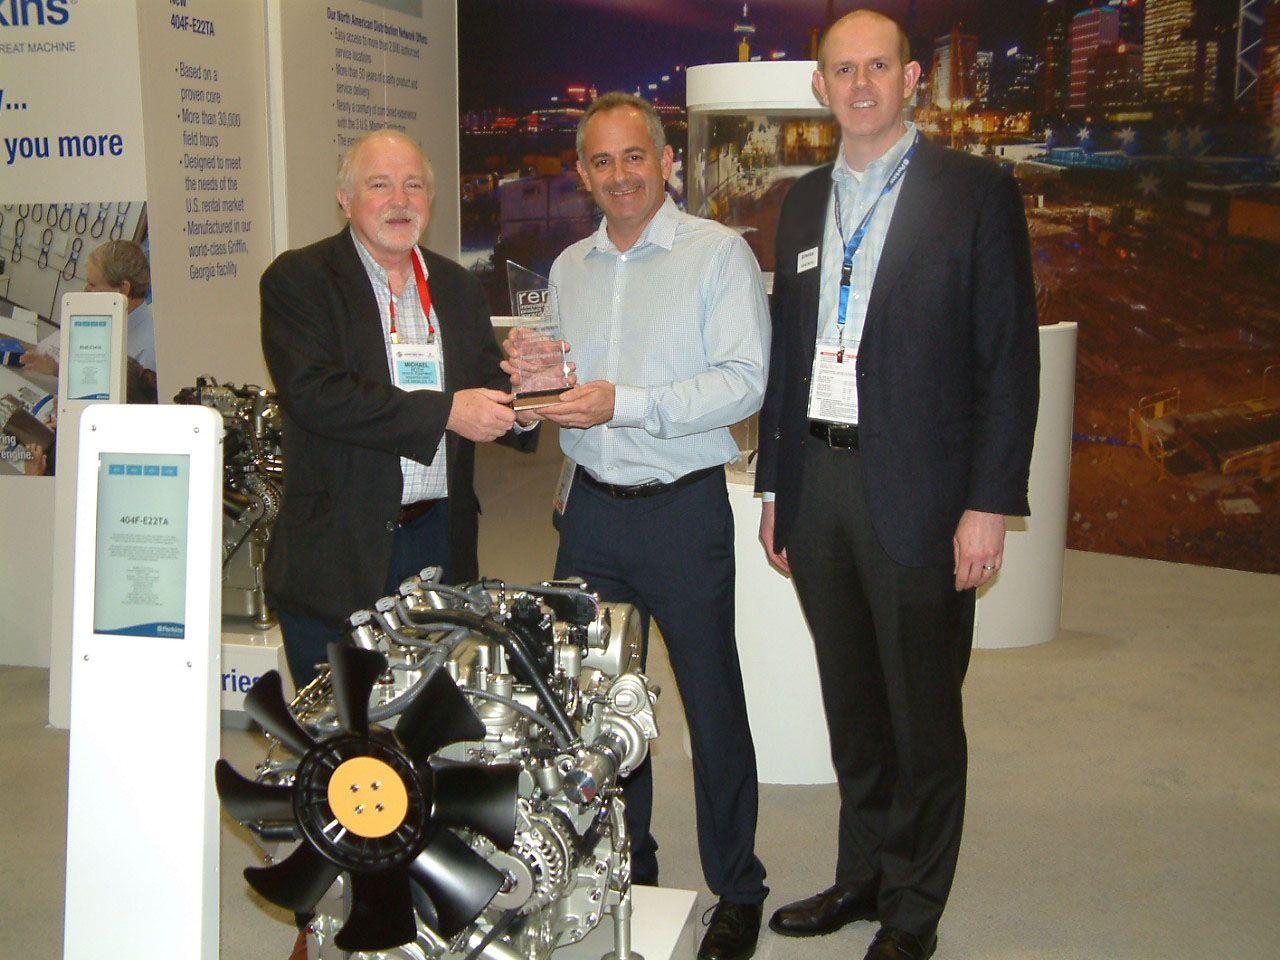 Perkins wins Rental Equipment Register magazine's Innovative Product Award